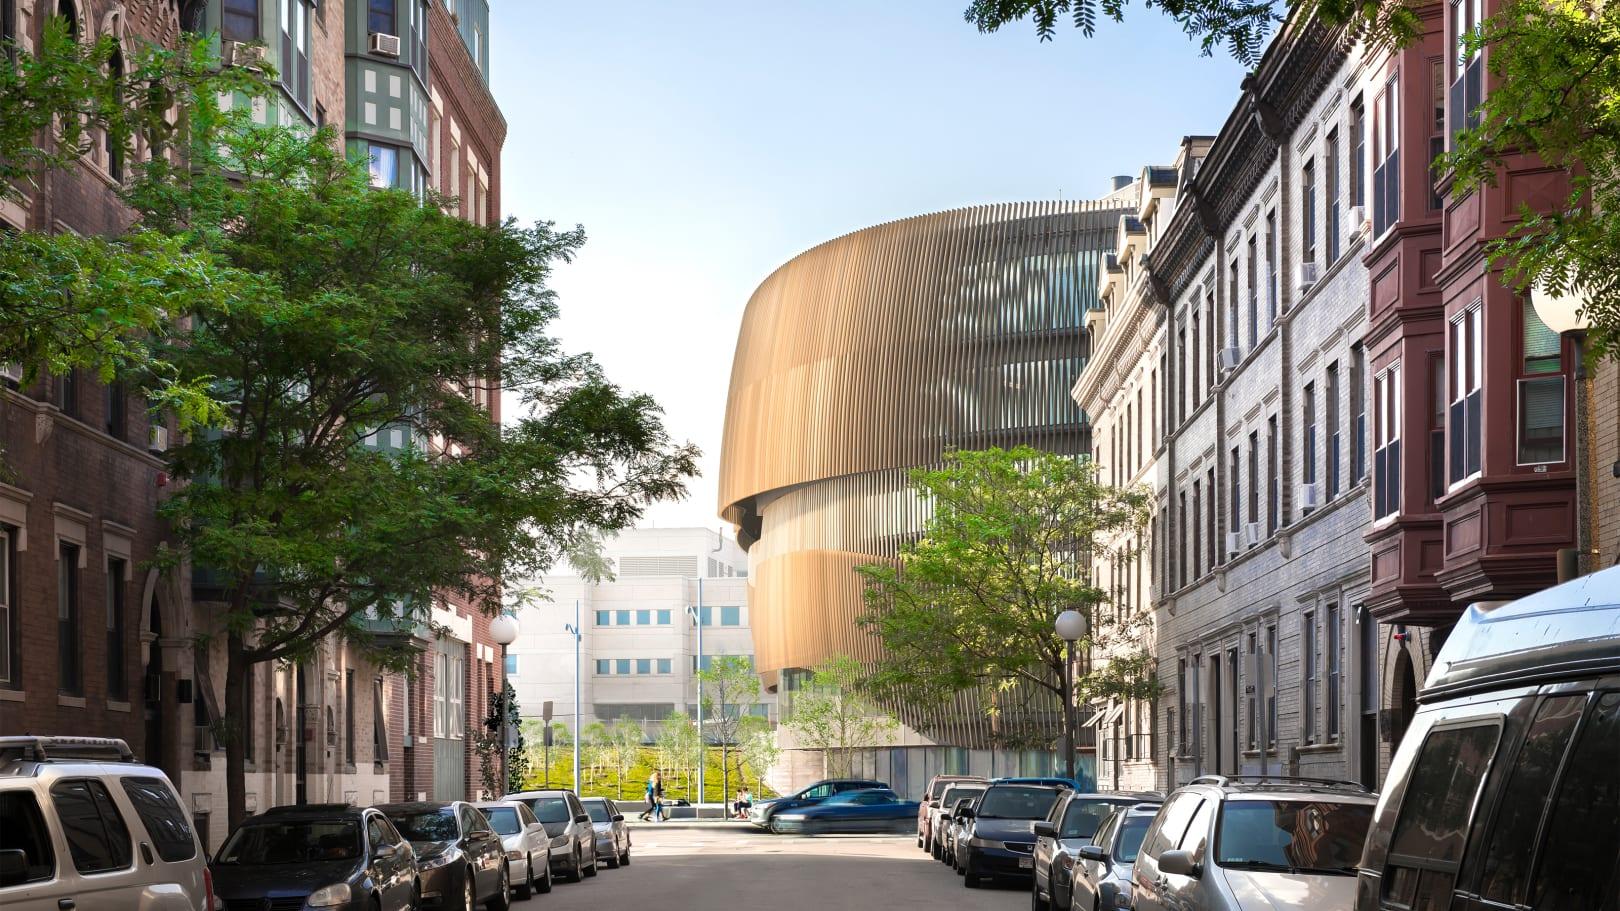 5_Northeastern University_Warren Jagger_AIA Urban Design Award_Announcement Image